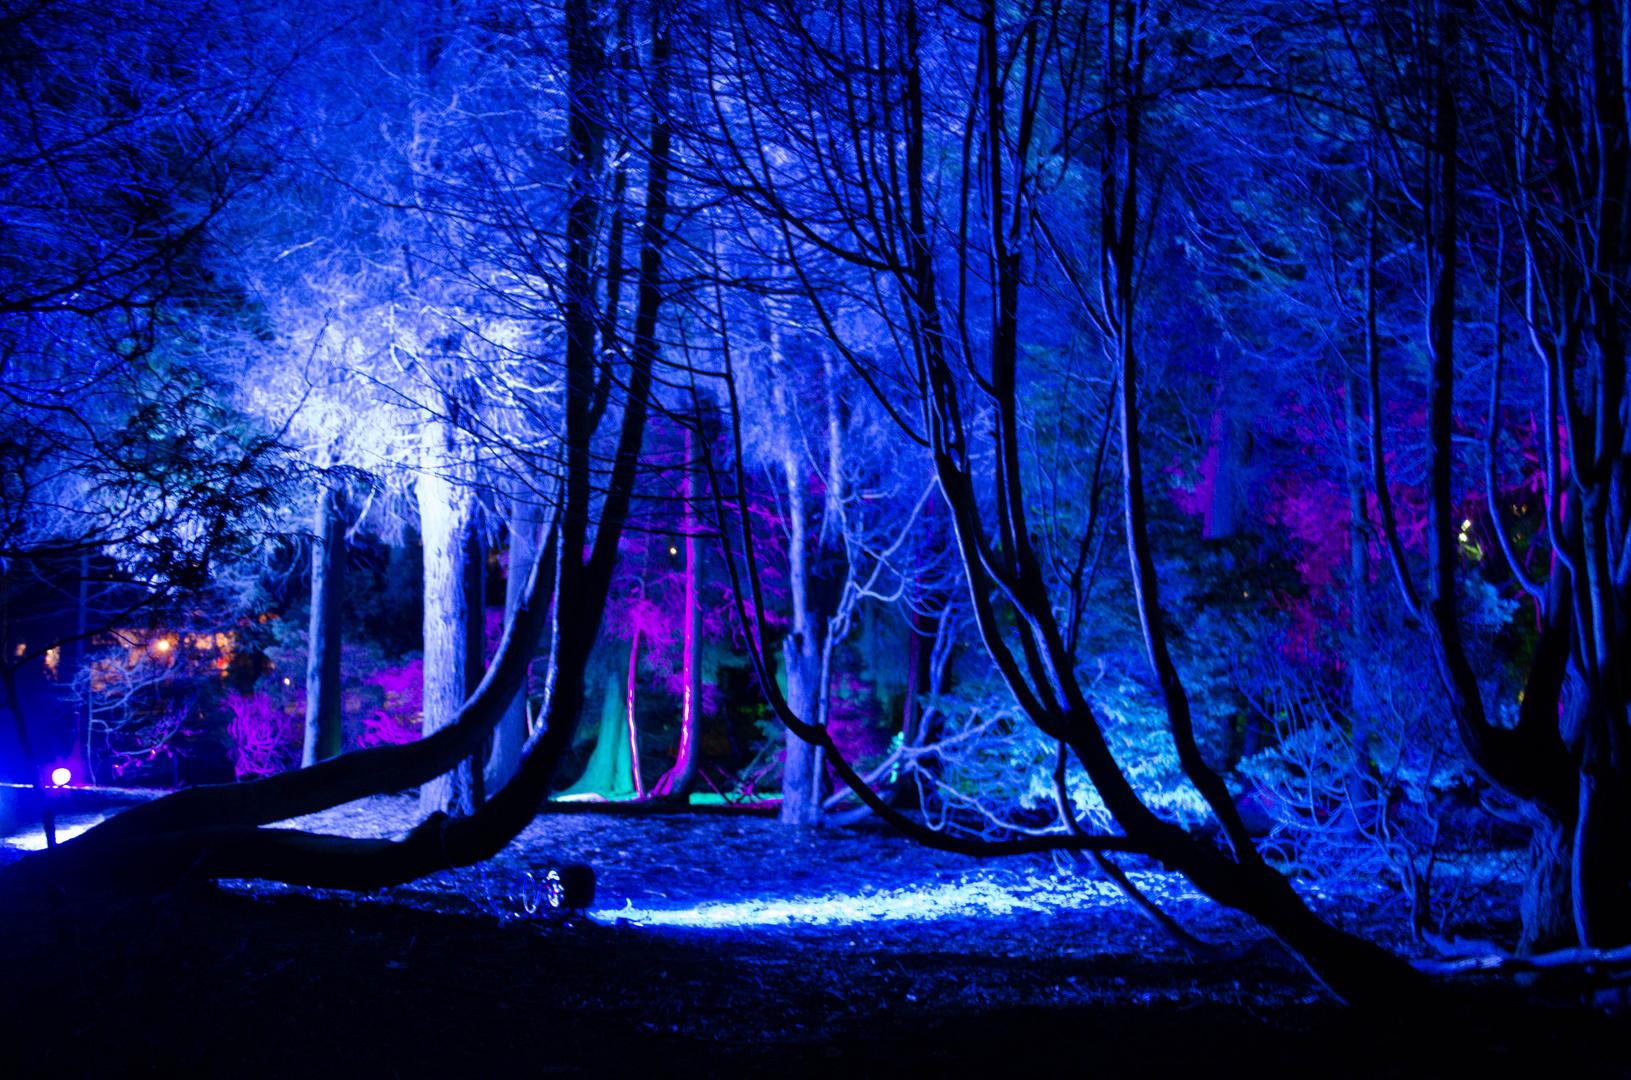 Bunte Nacht - Wald